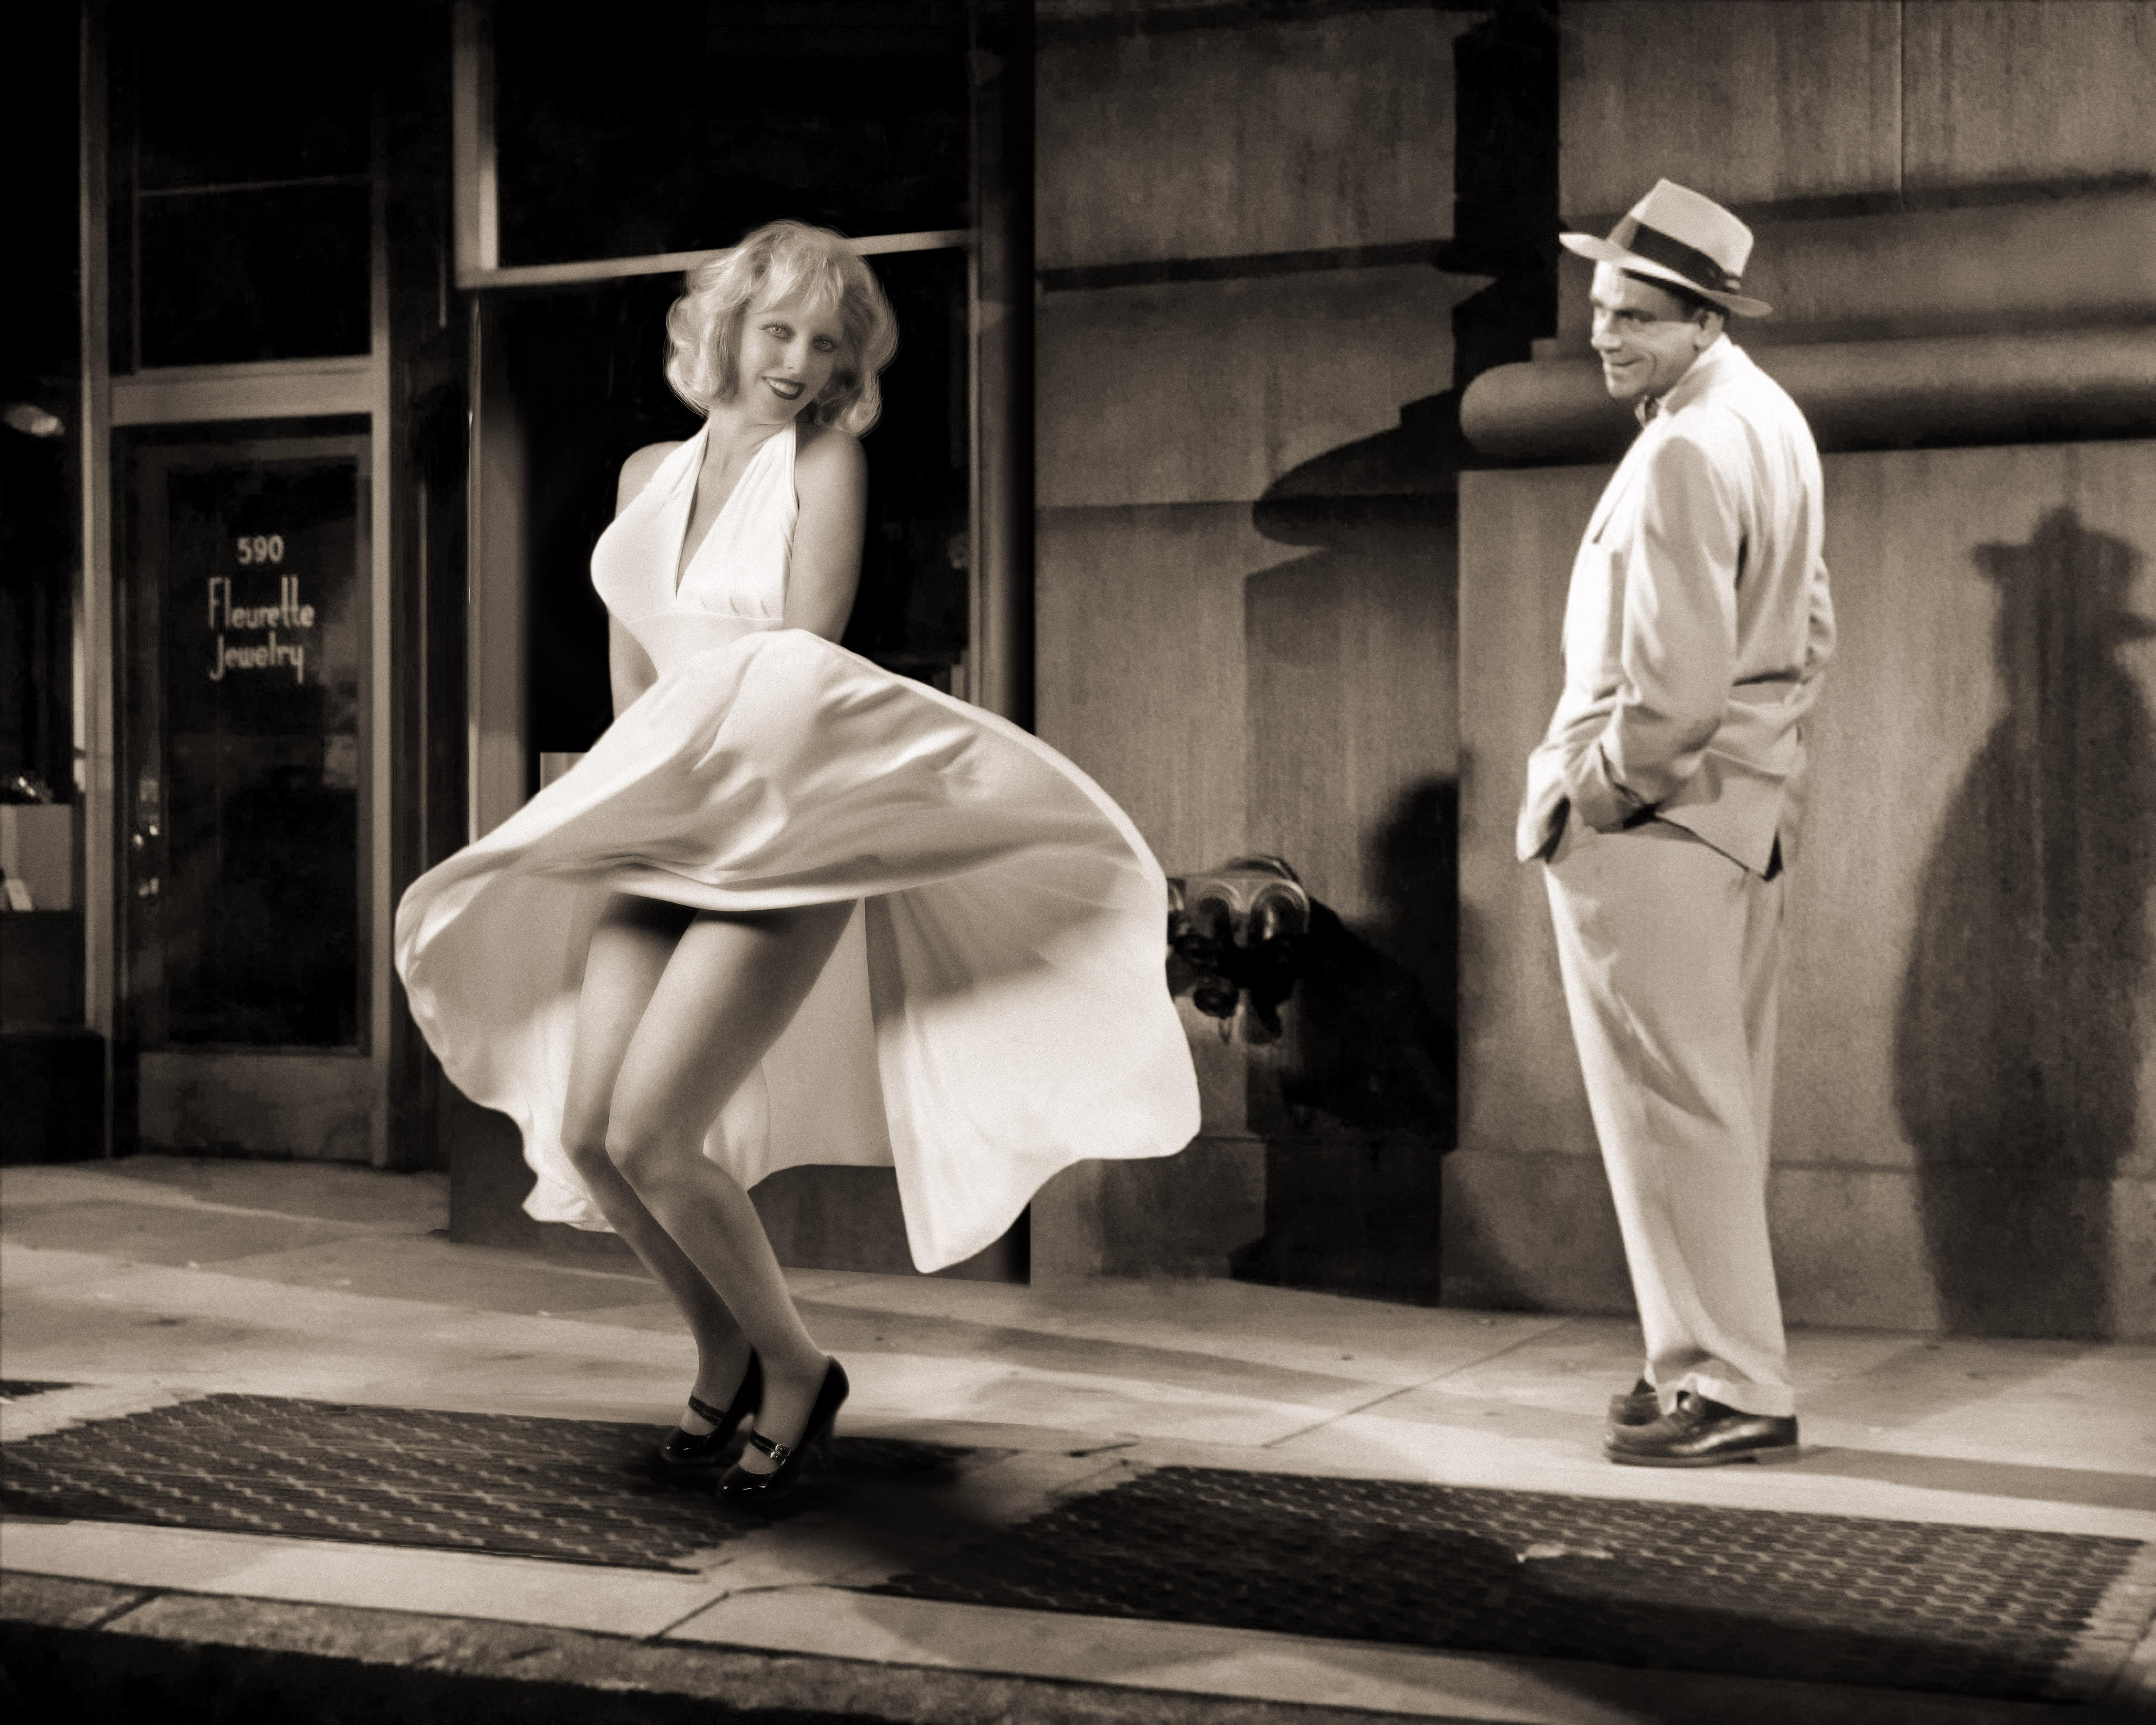 Roni as Marilyn Monroe